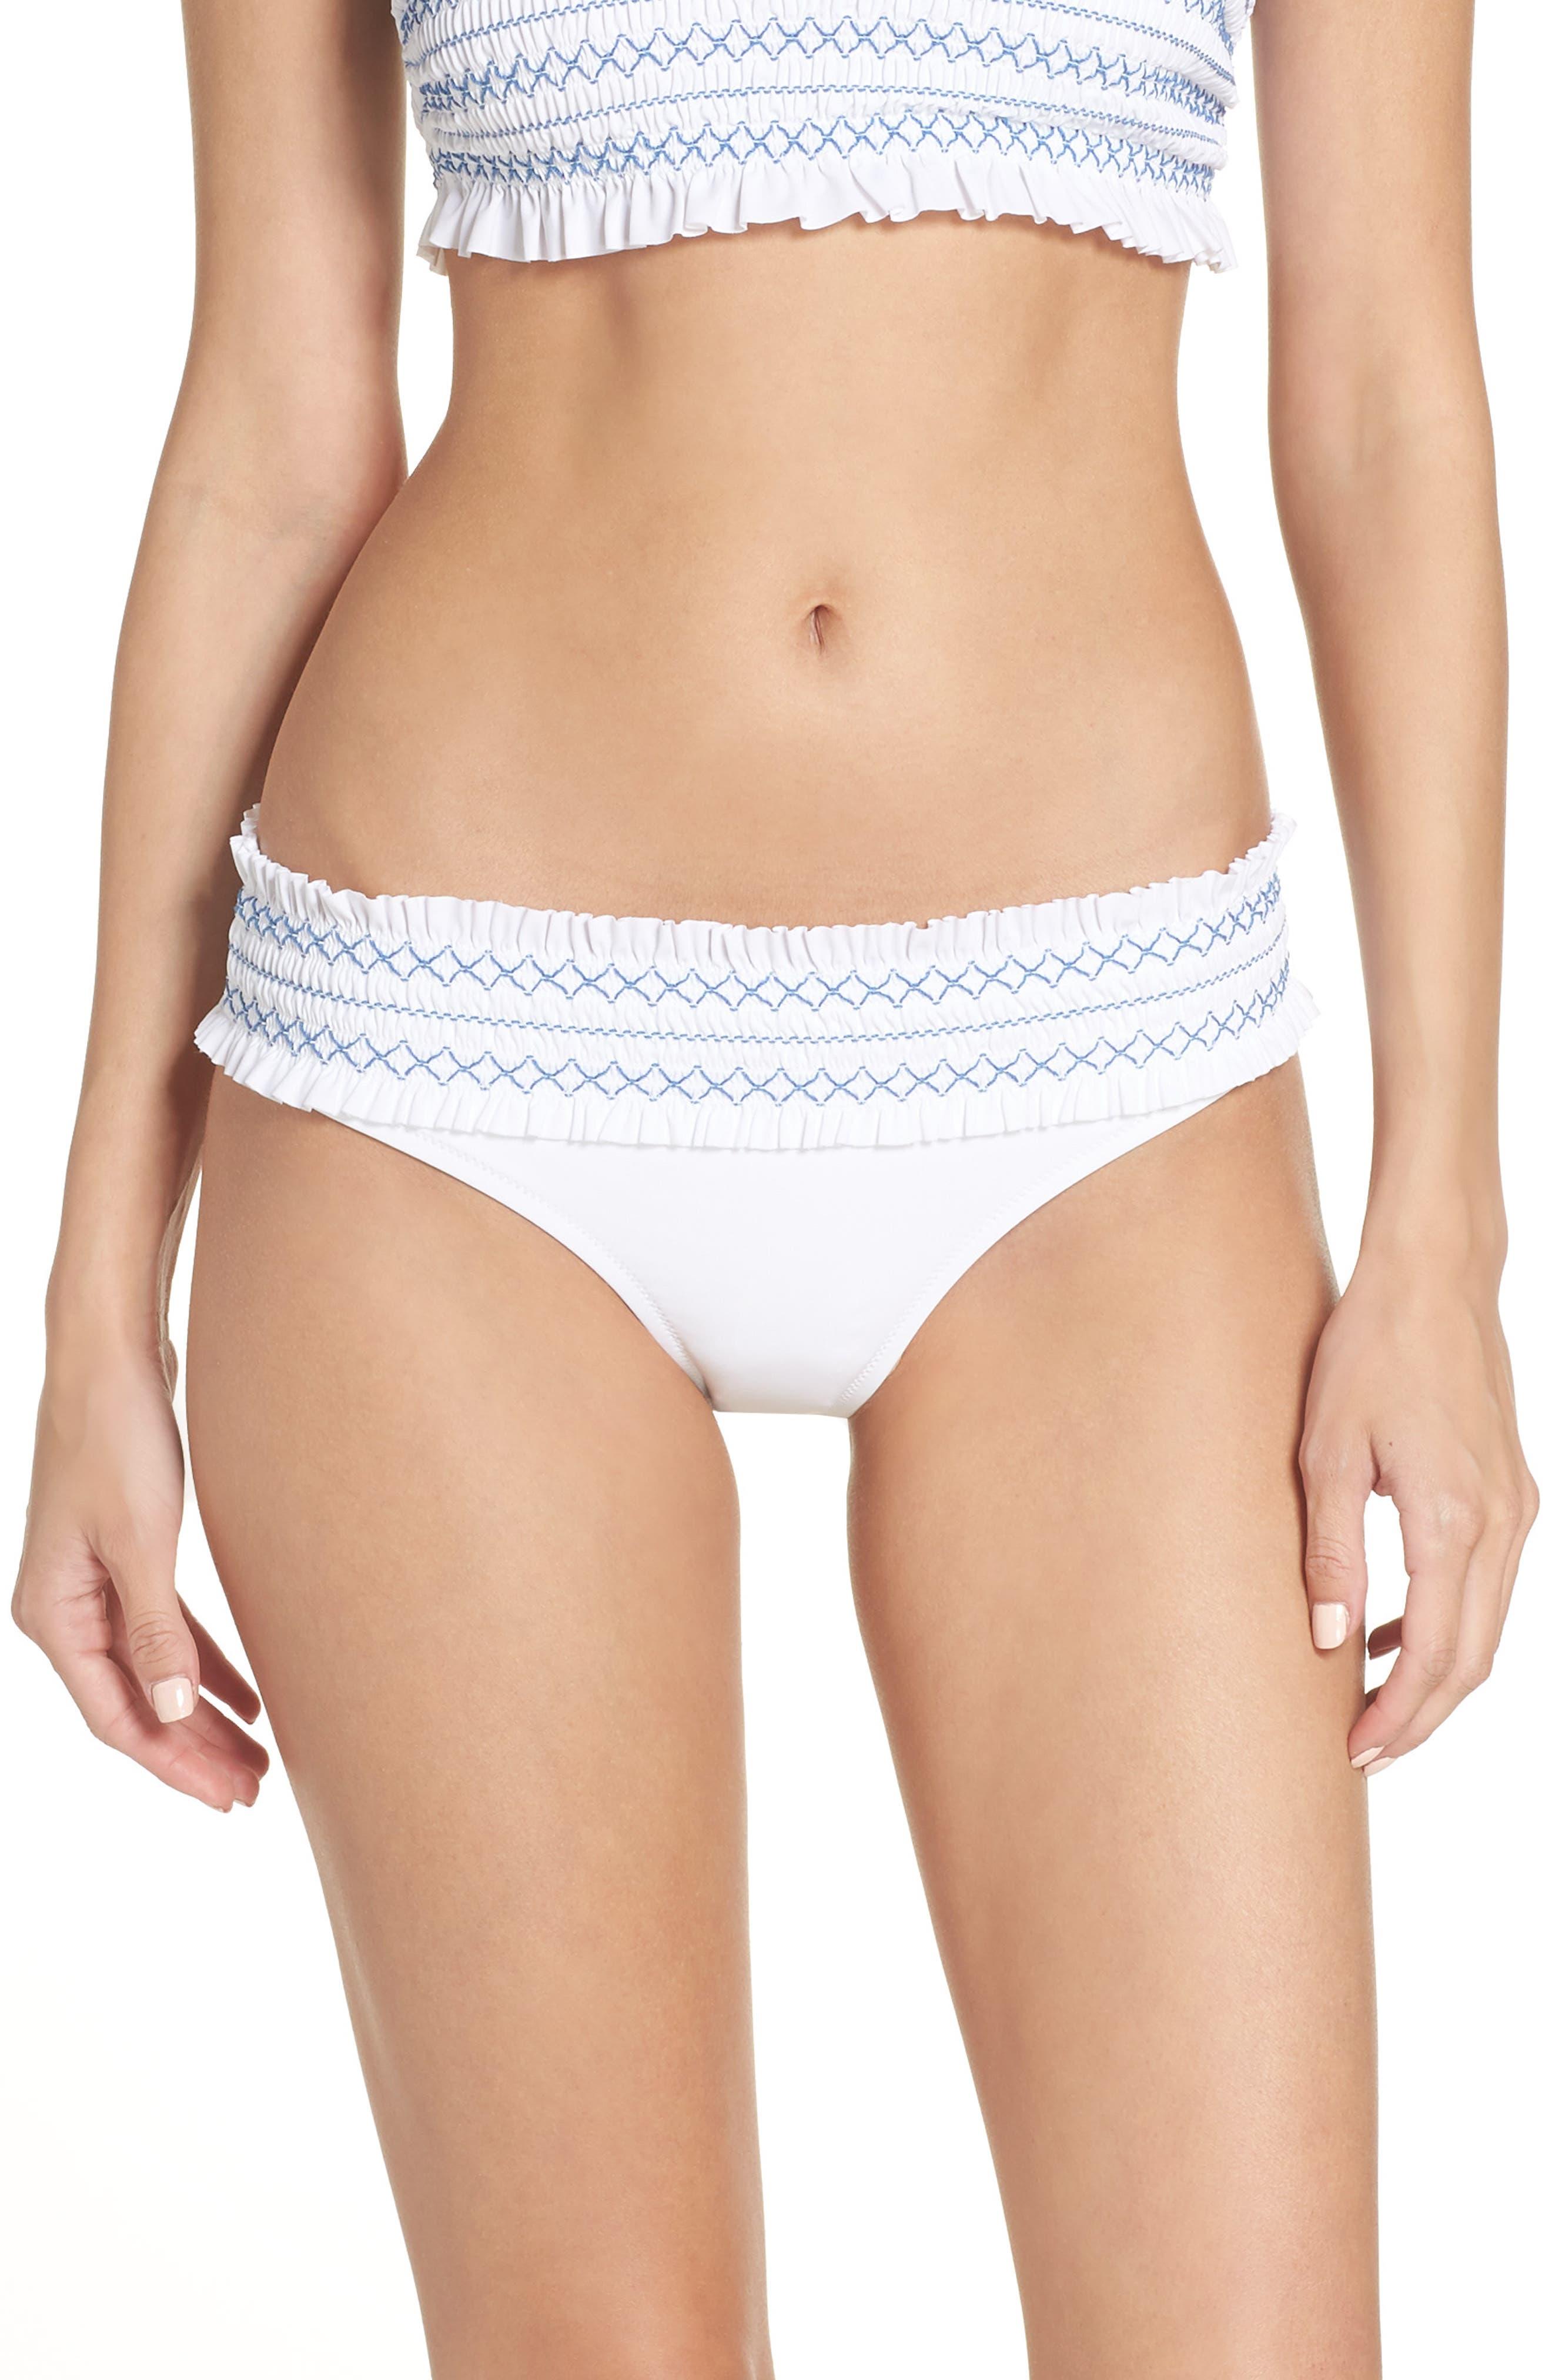 Costa Smocked Hipster Bikini Bottoms,                             Main thumbnail 1, color,                             WHITE / BLUE DUSK